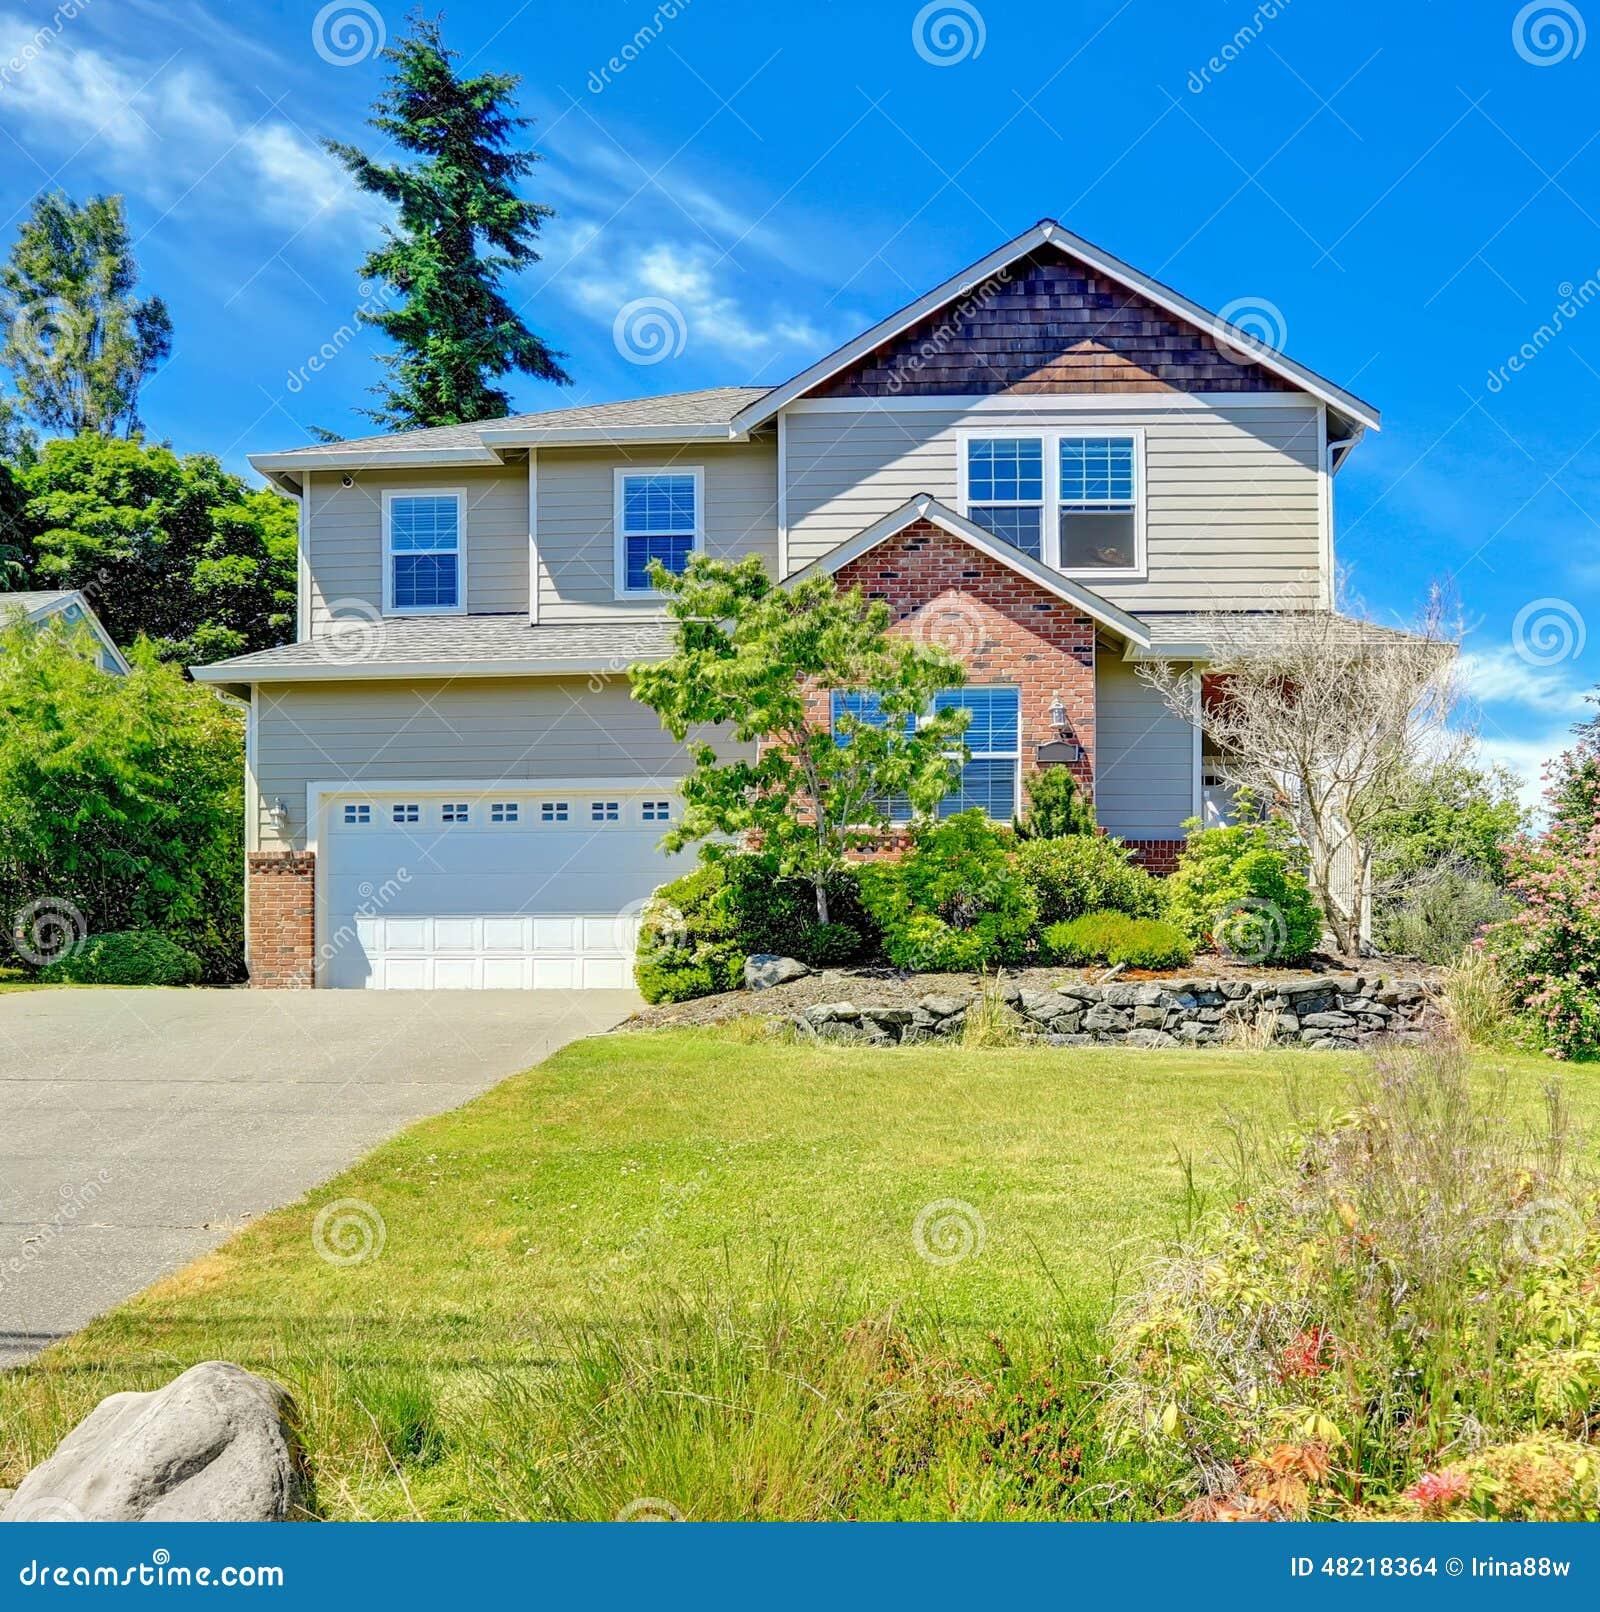 House Exterior With Brick Trim Stock Photo